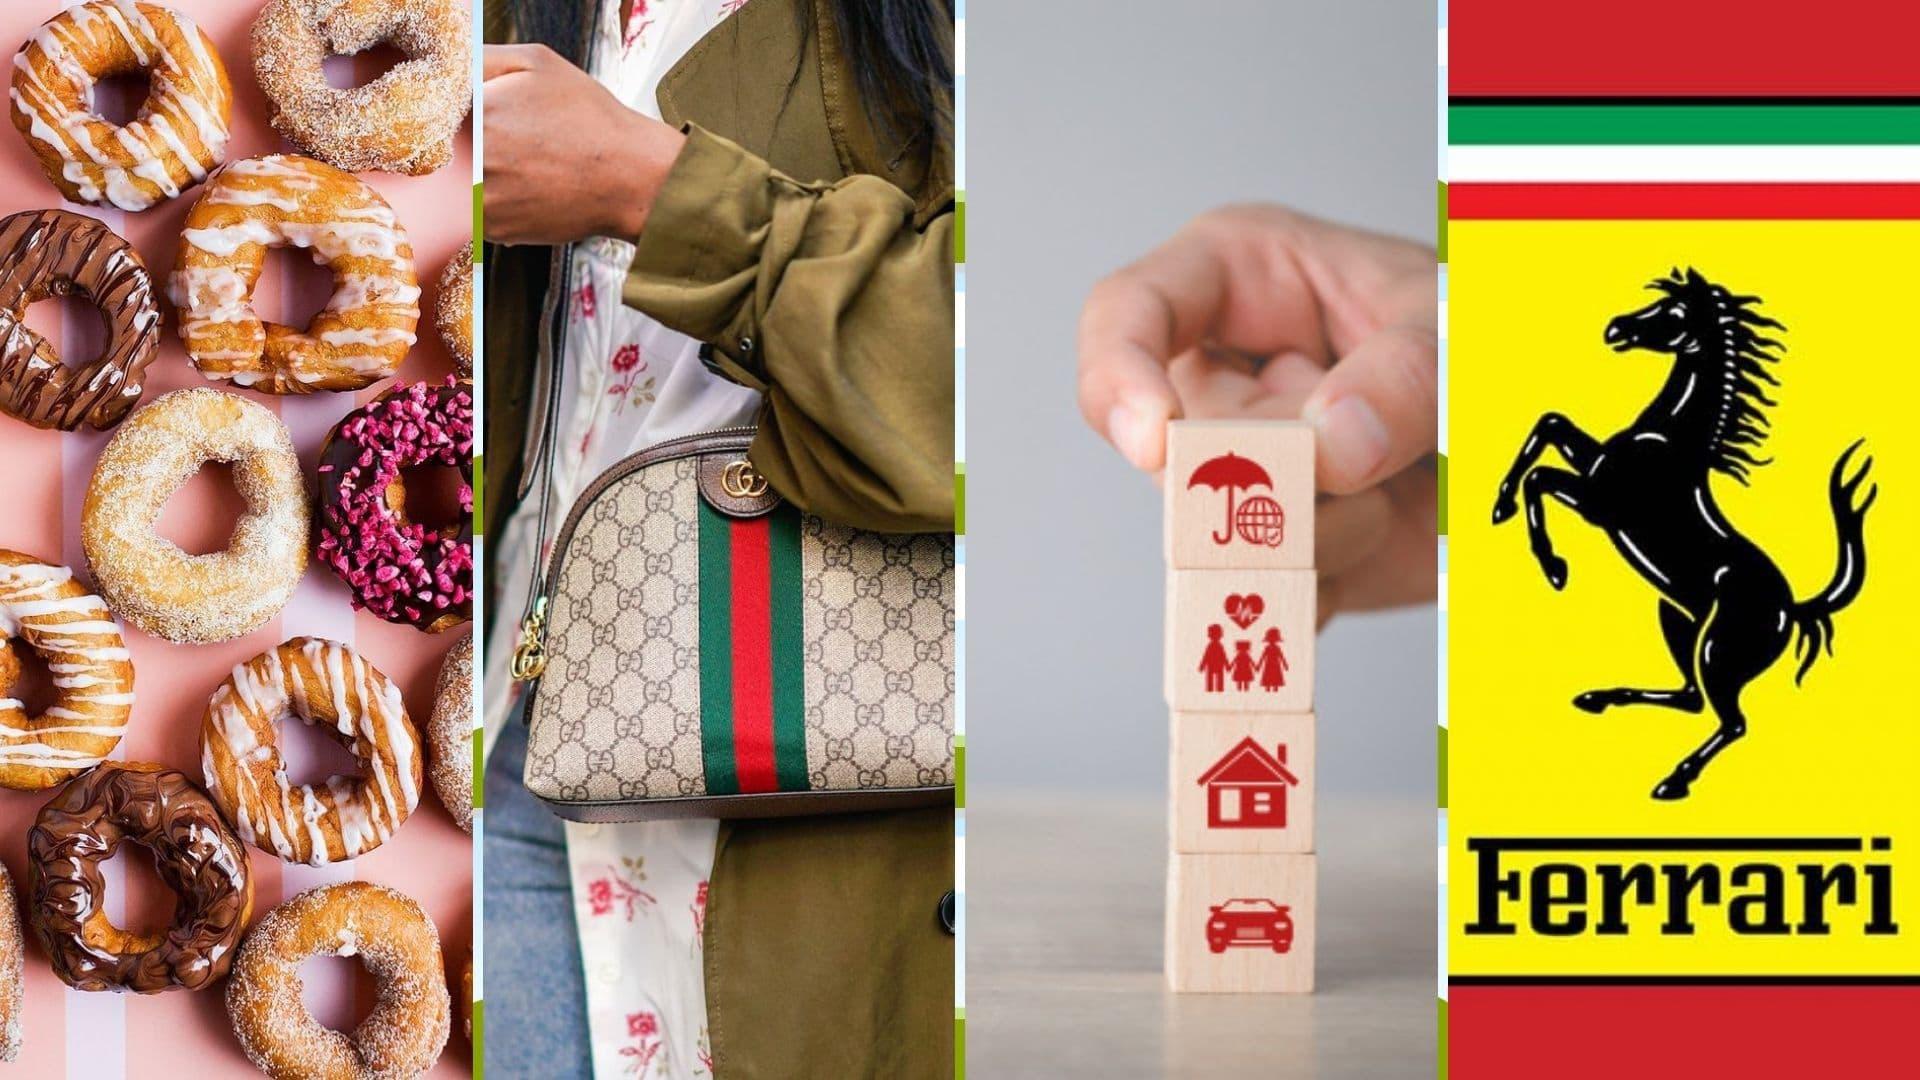 Consumer Goods examples